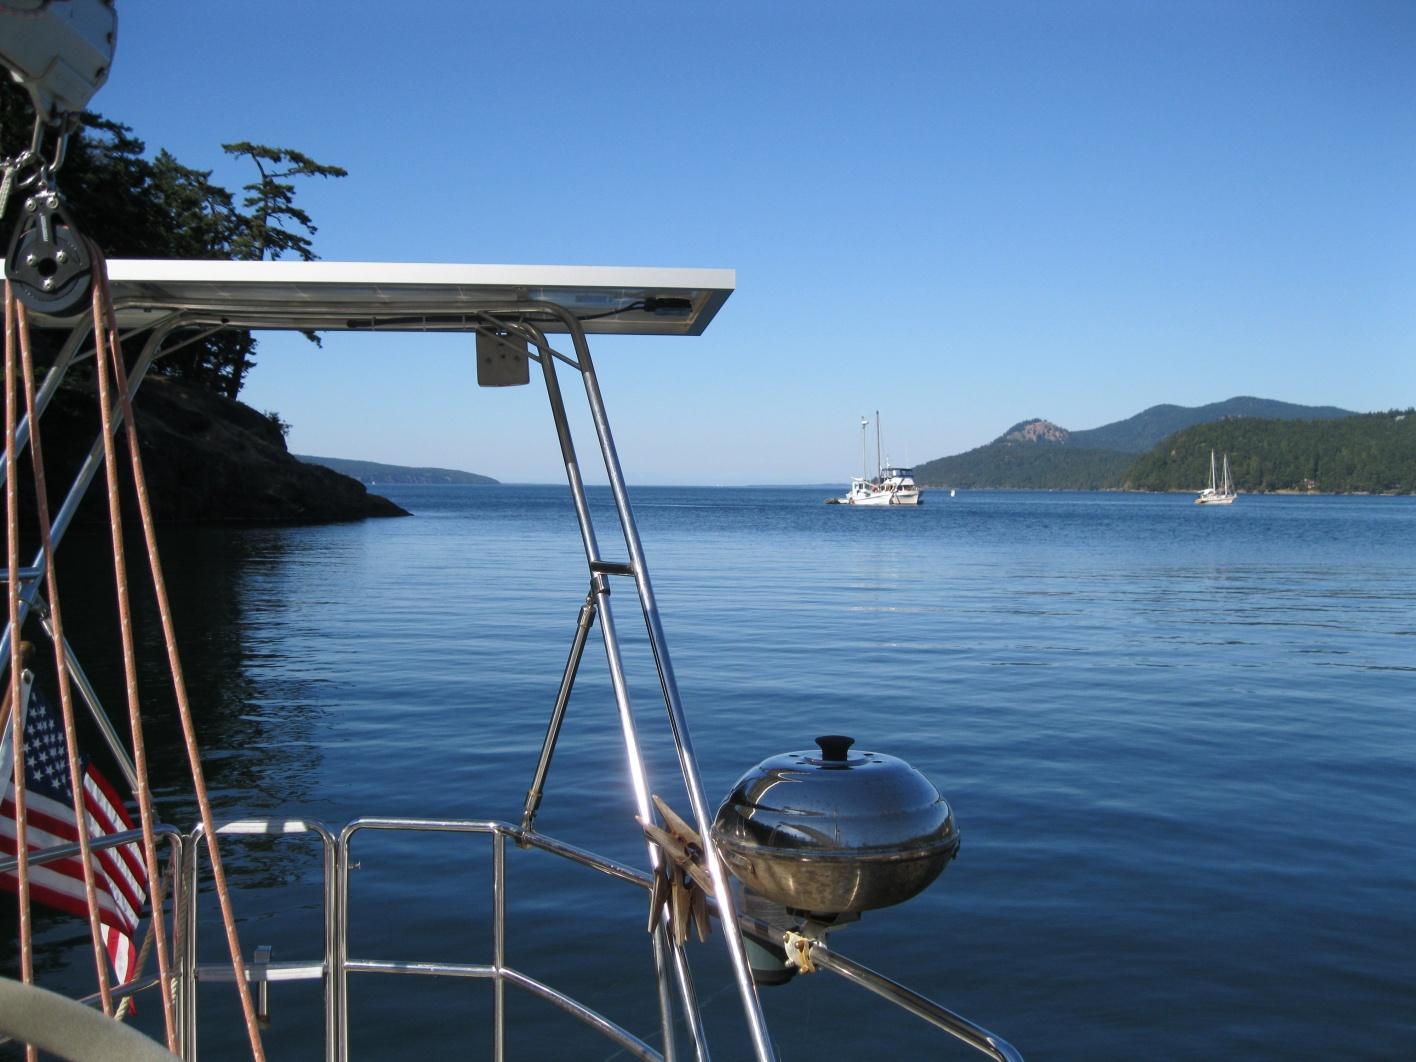 Click image for larger version  Name:Summer sailing 001.jpg Views:61 Size:405.7 KB ID:19732